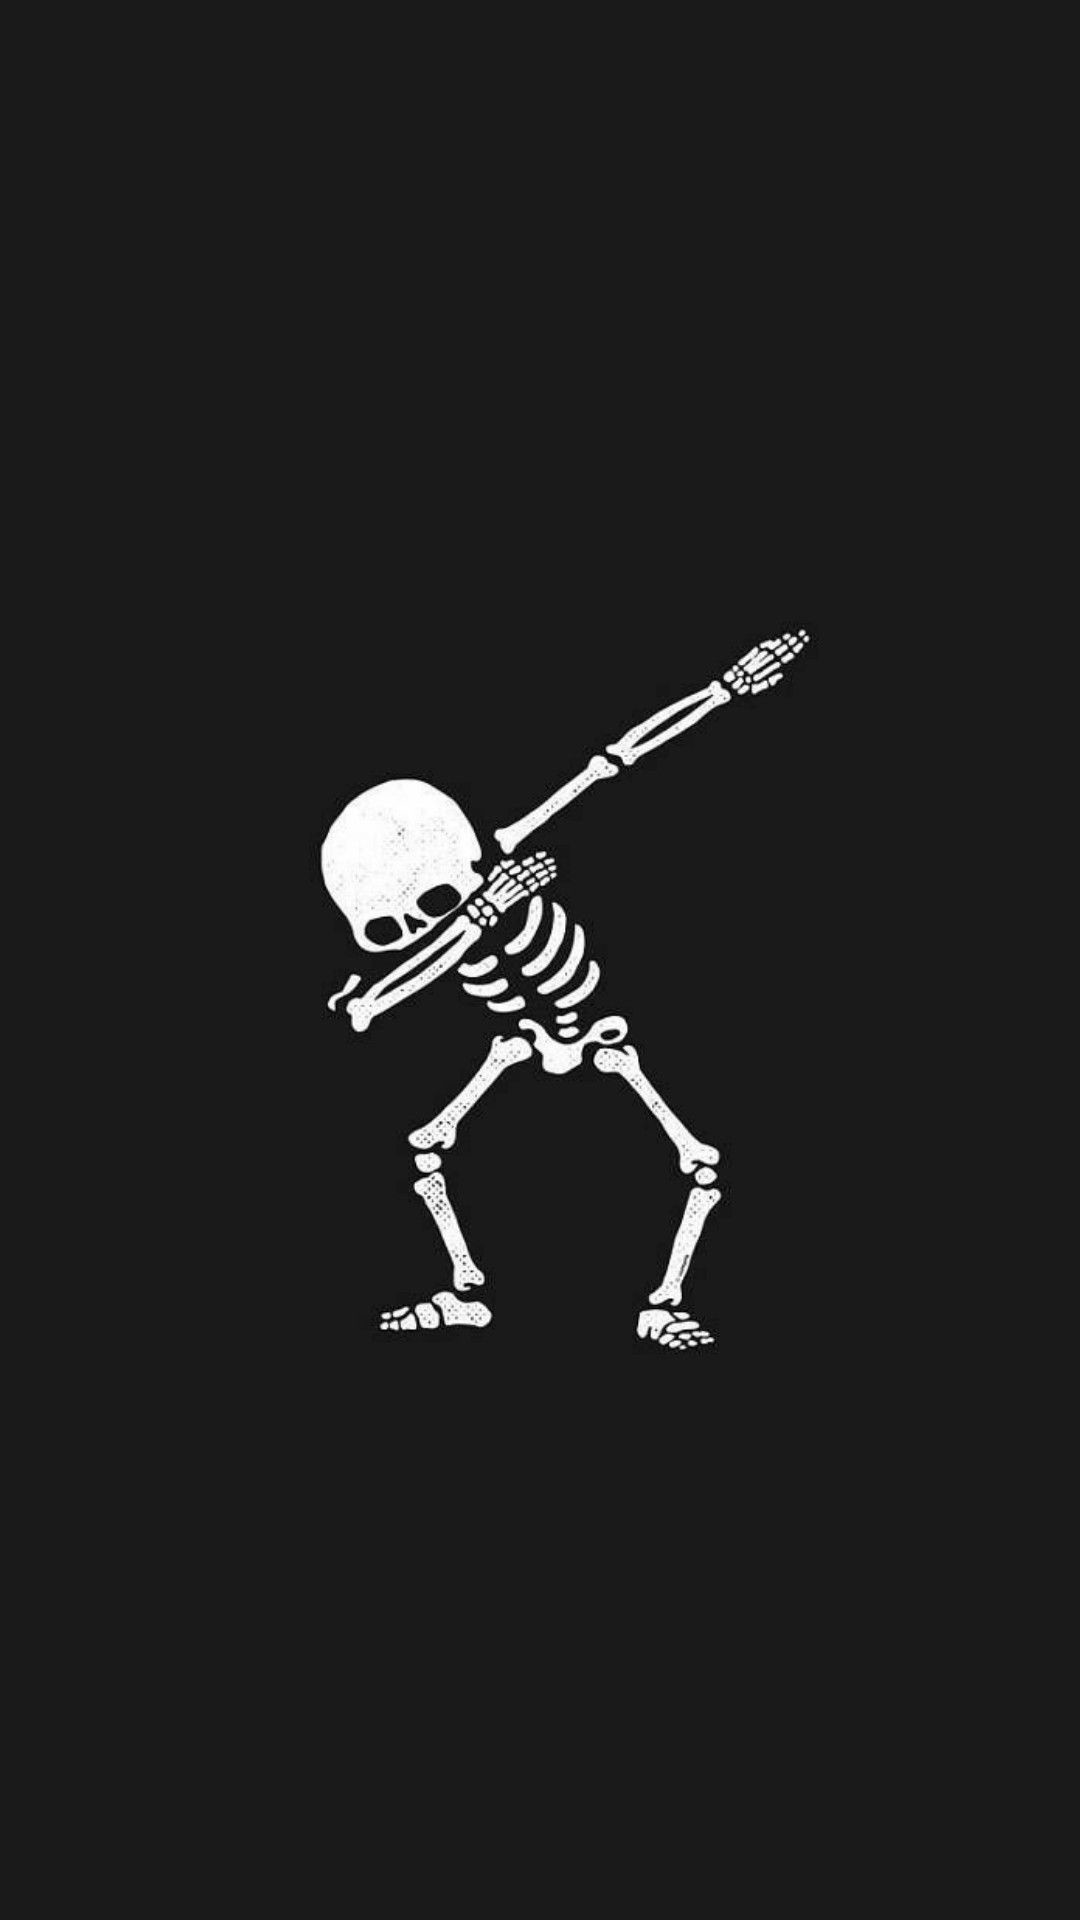 Halloween Skeleton Wallpaper.Halloween Skeleton Wallpaper 65 Images